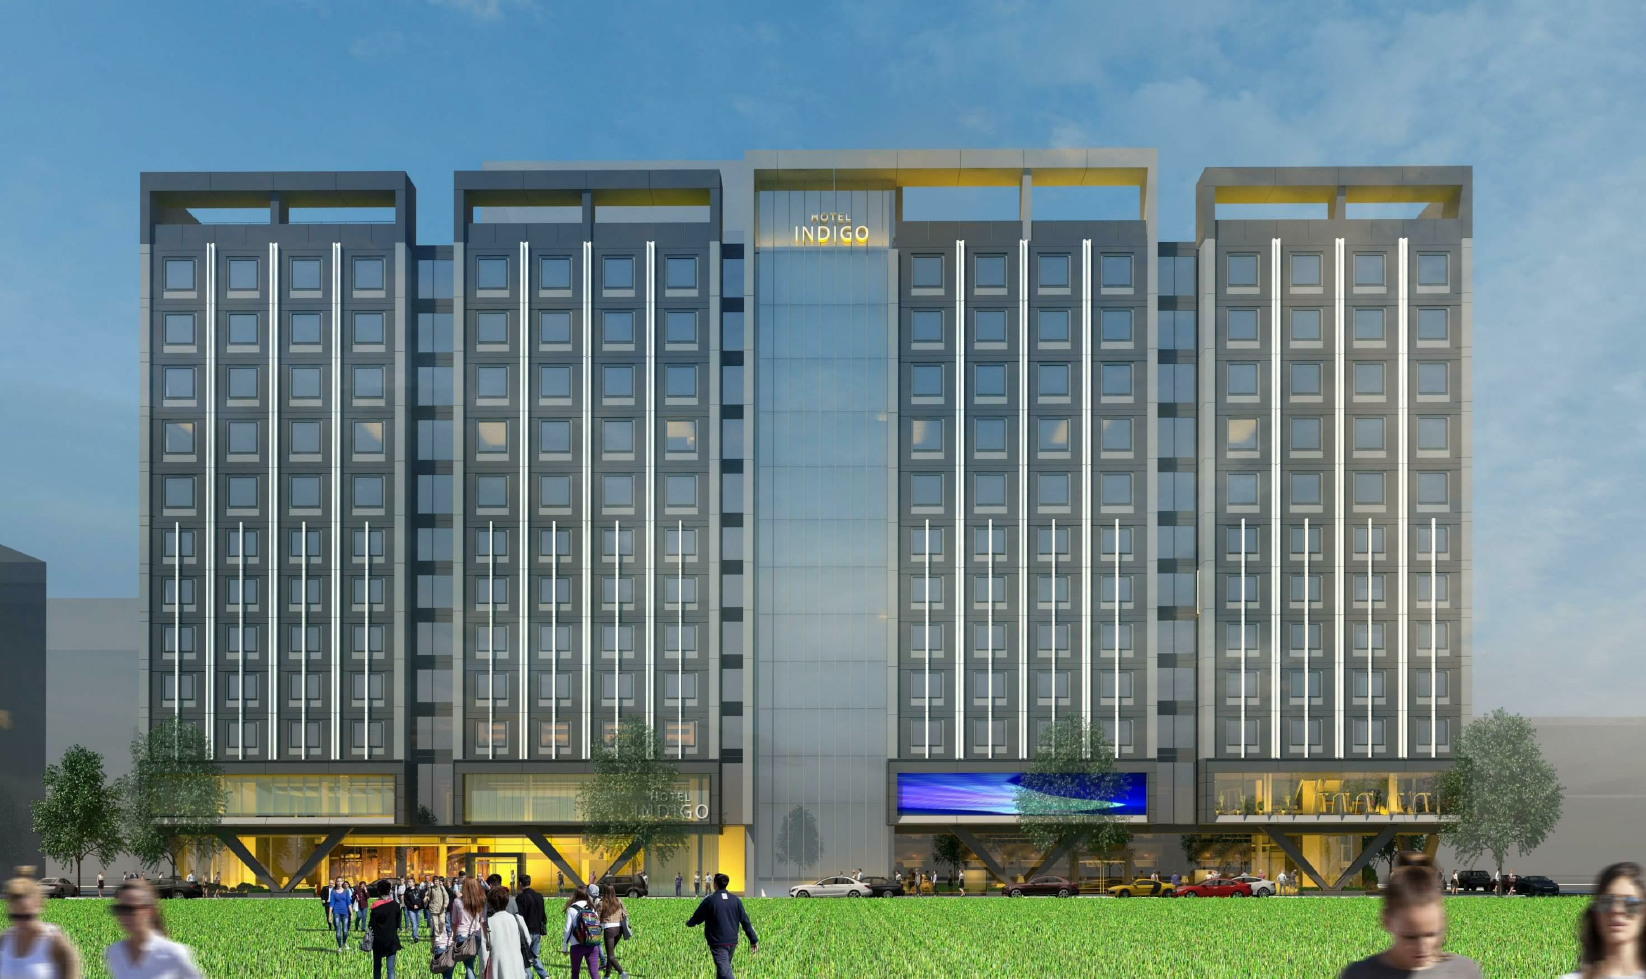 ACDA proposes controversial development at transit center garage